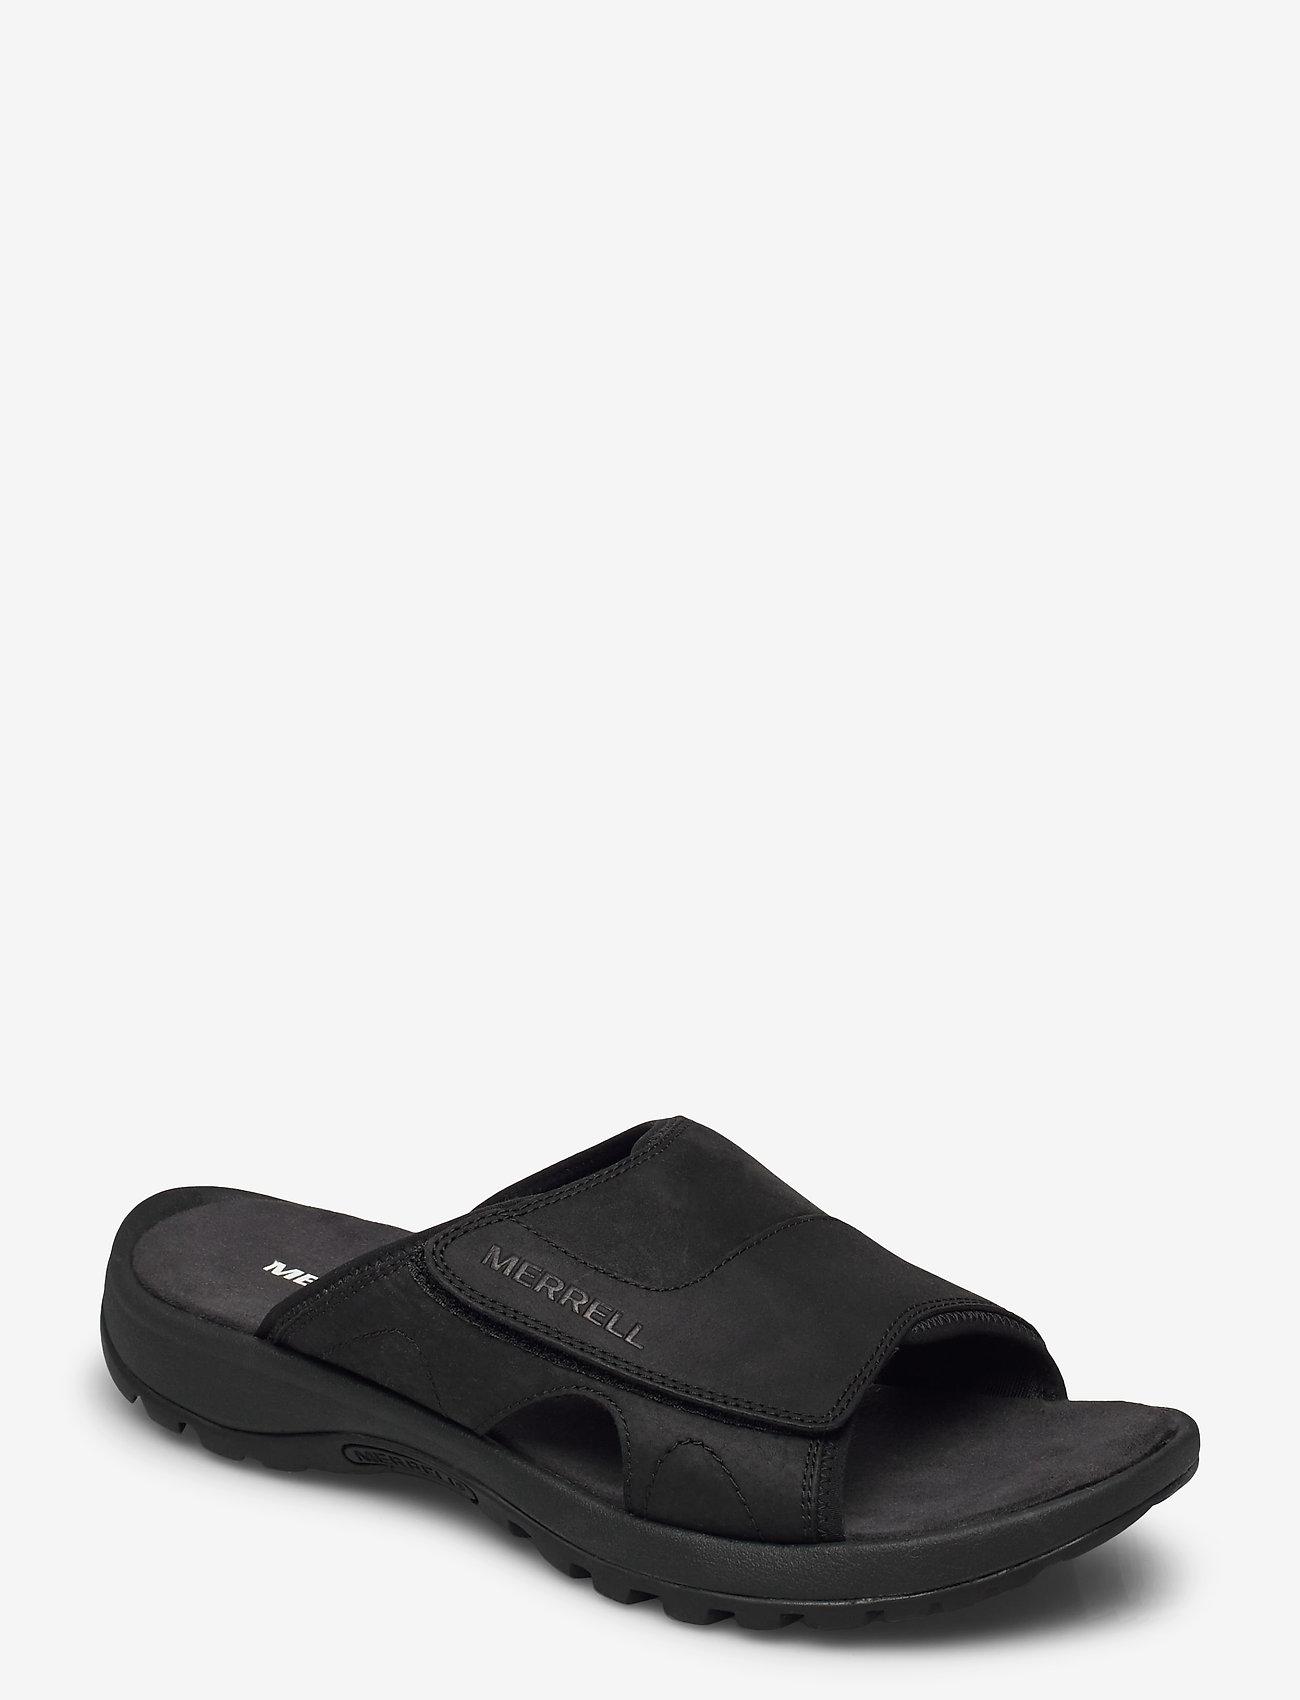 Merrell - Sandspur 2 Slide Black - pool sliders - black - 0